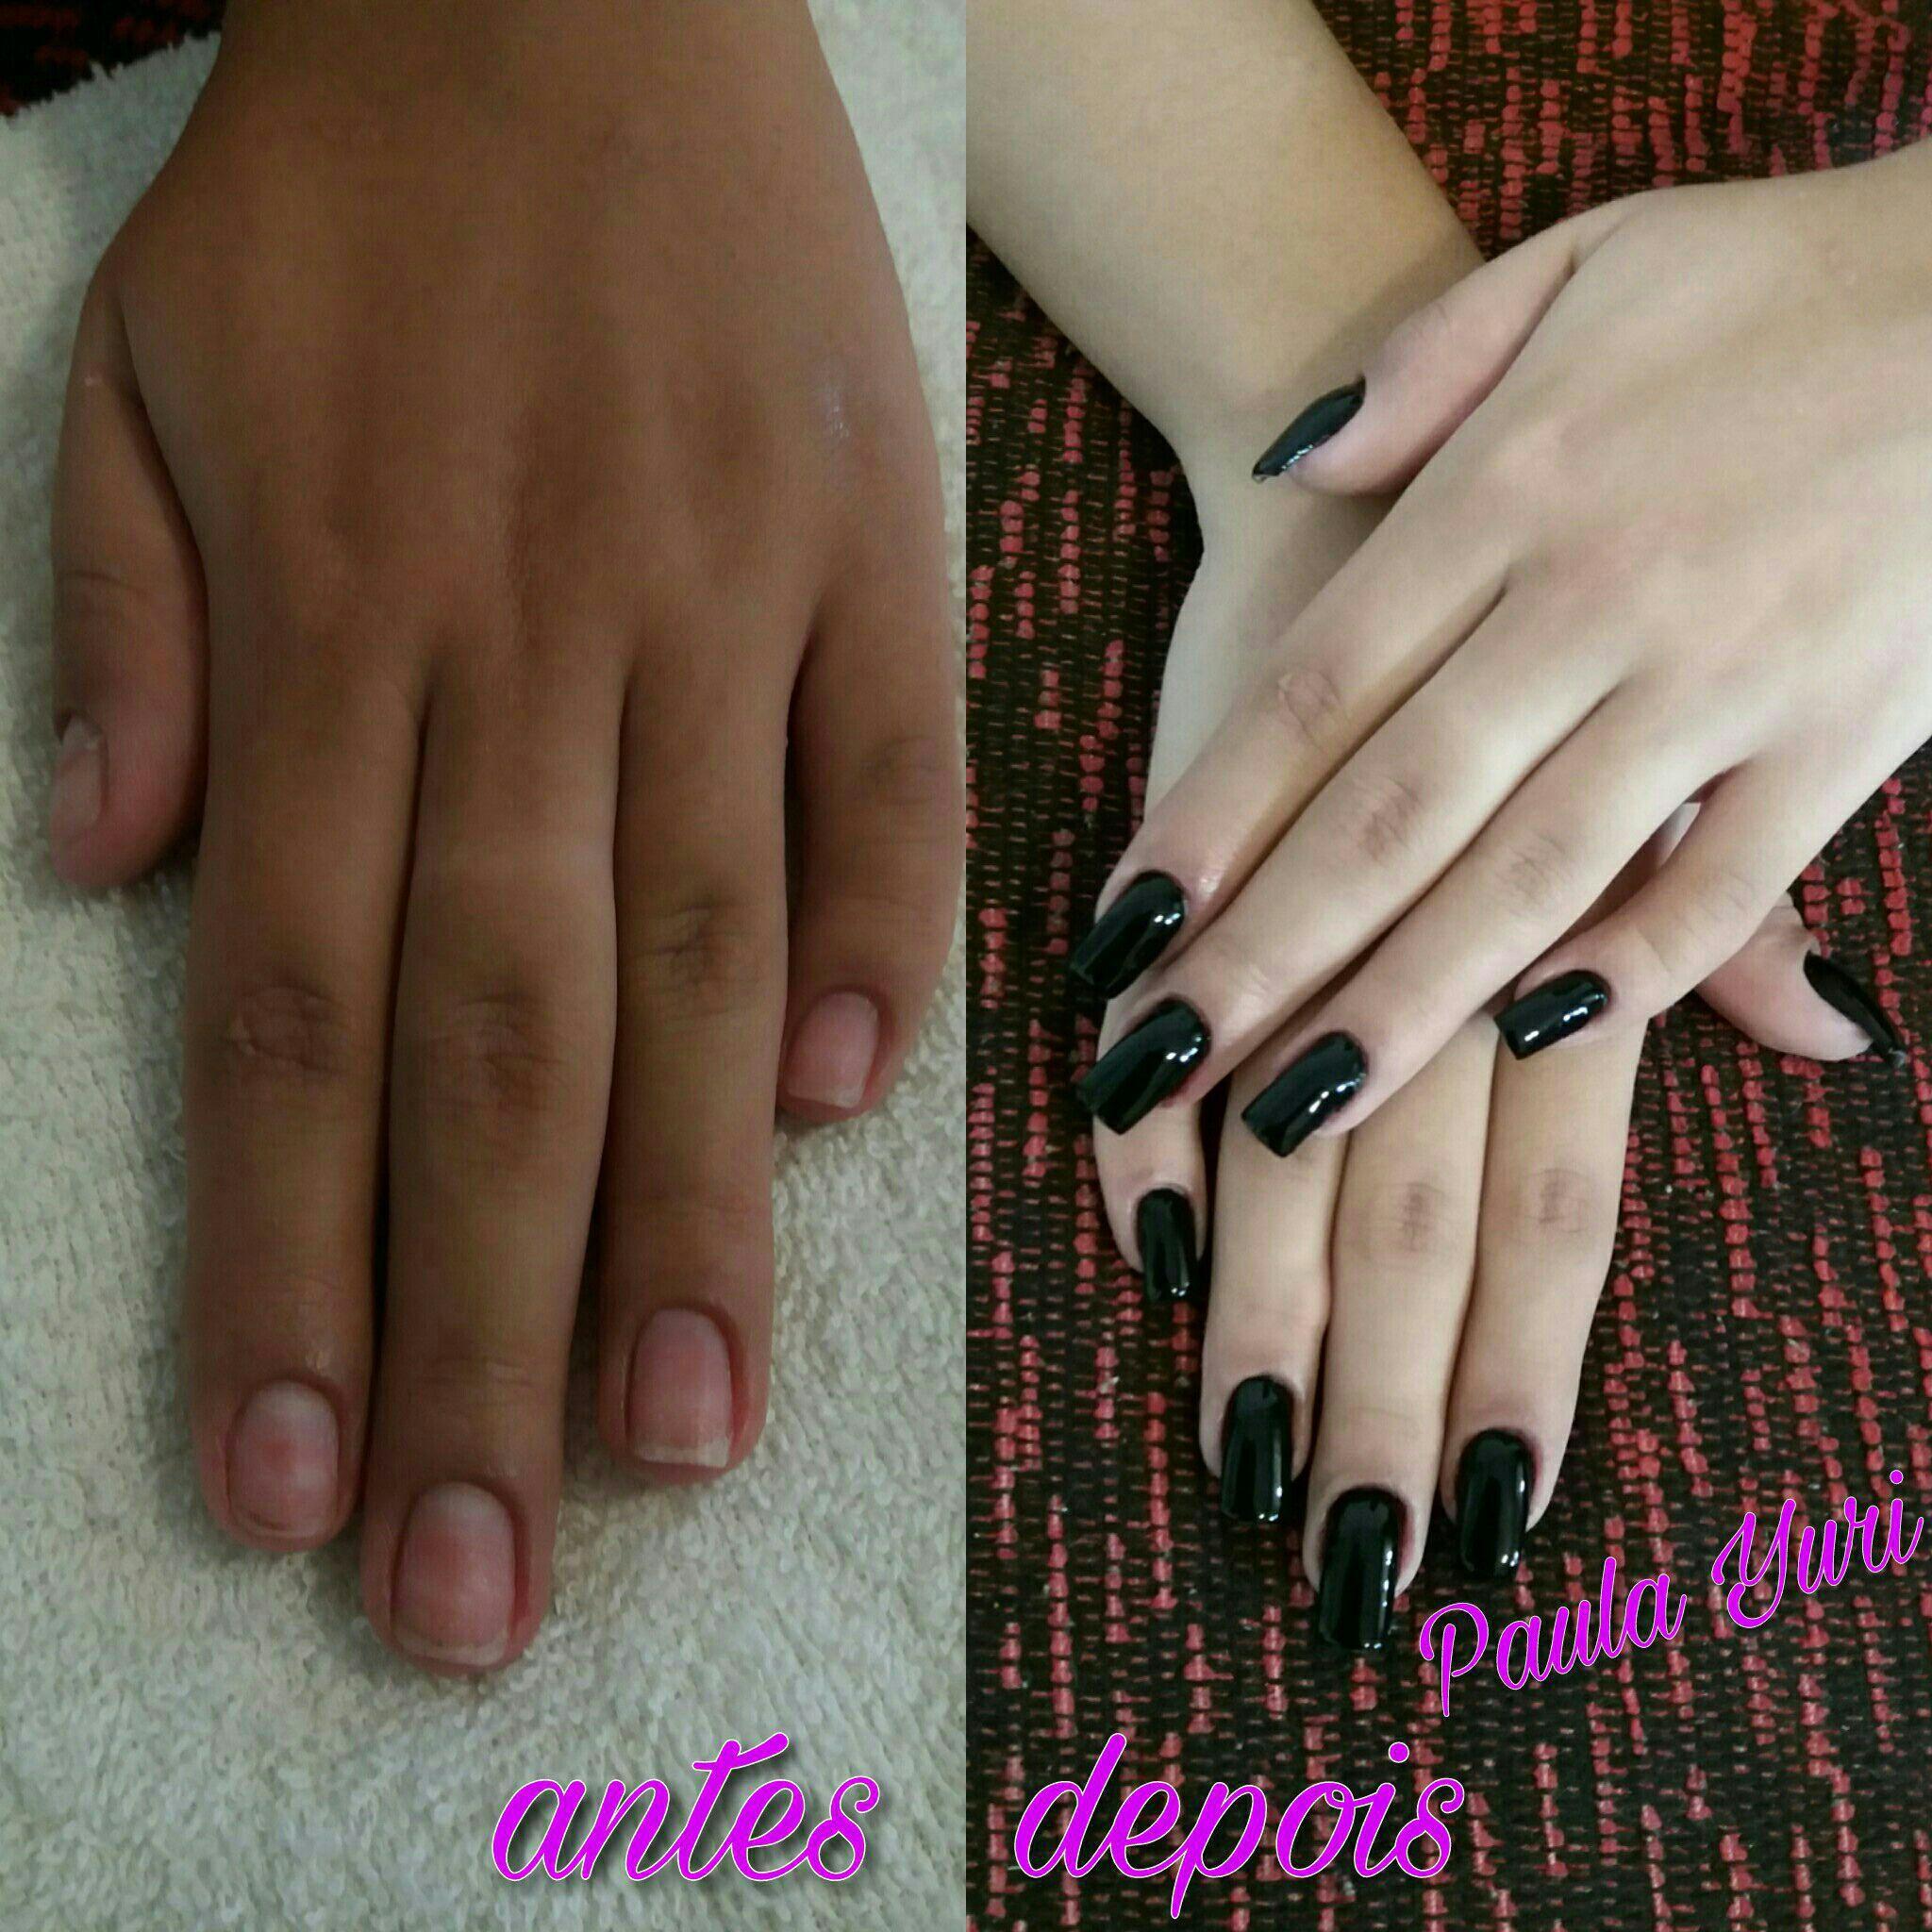 unha esteticista maquiador(a) assistente esteticista auxiliar cabeleireiro(a) designer de sobrancelhas manicure e pedicure estudante (esteticista)